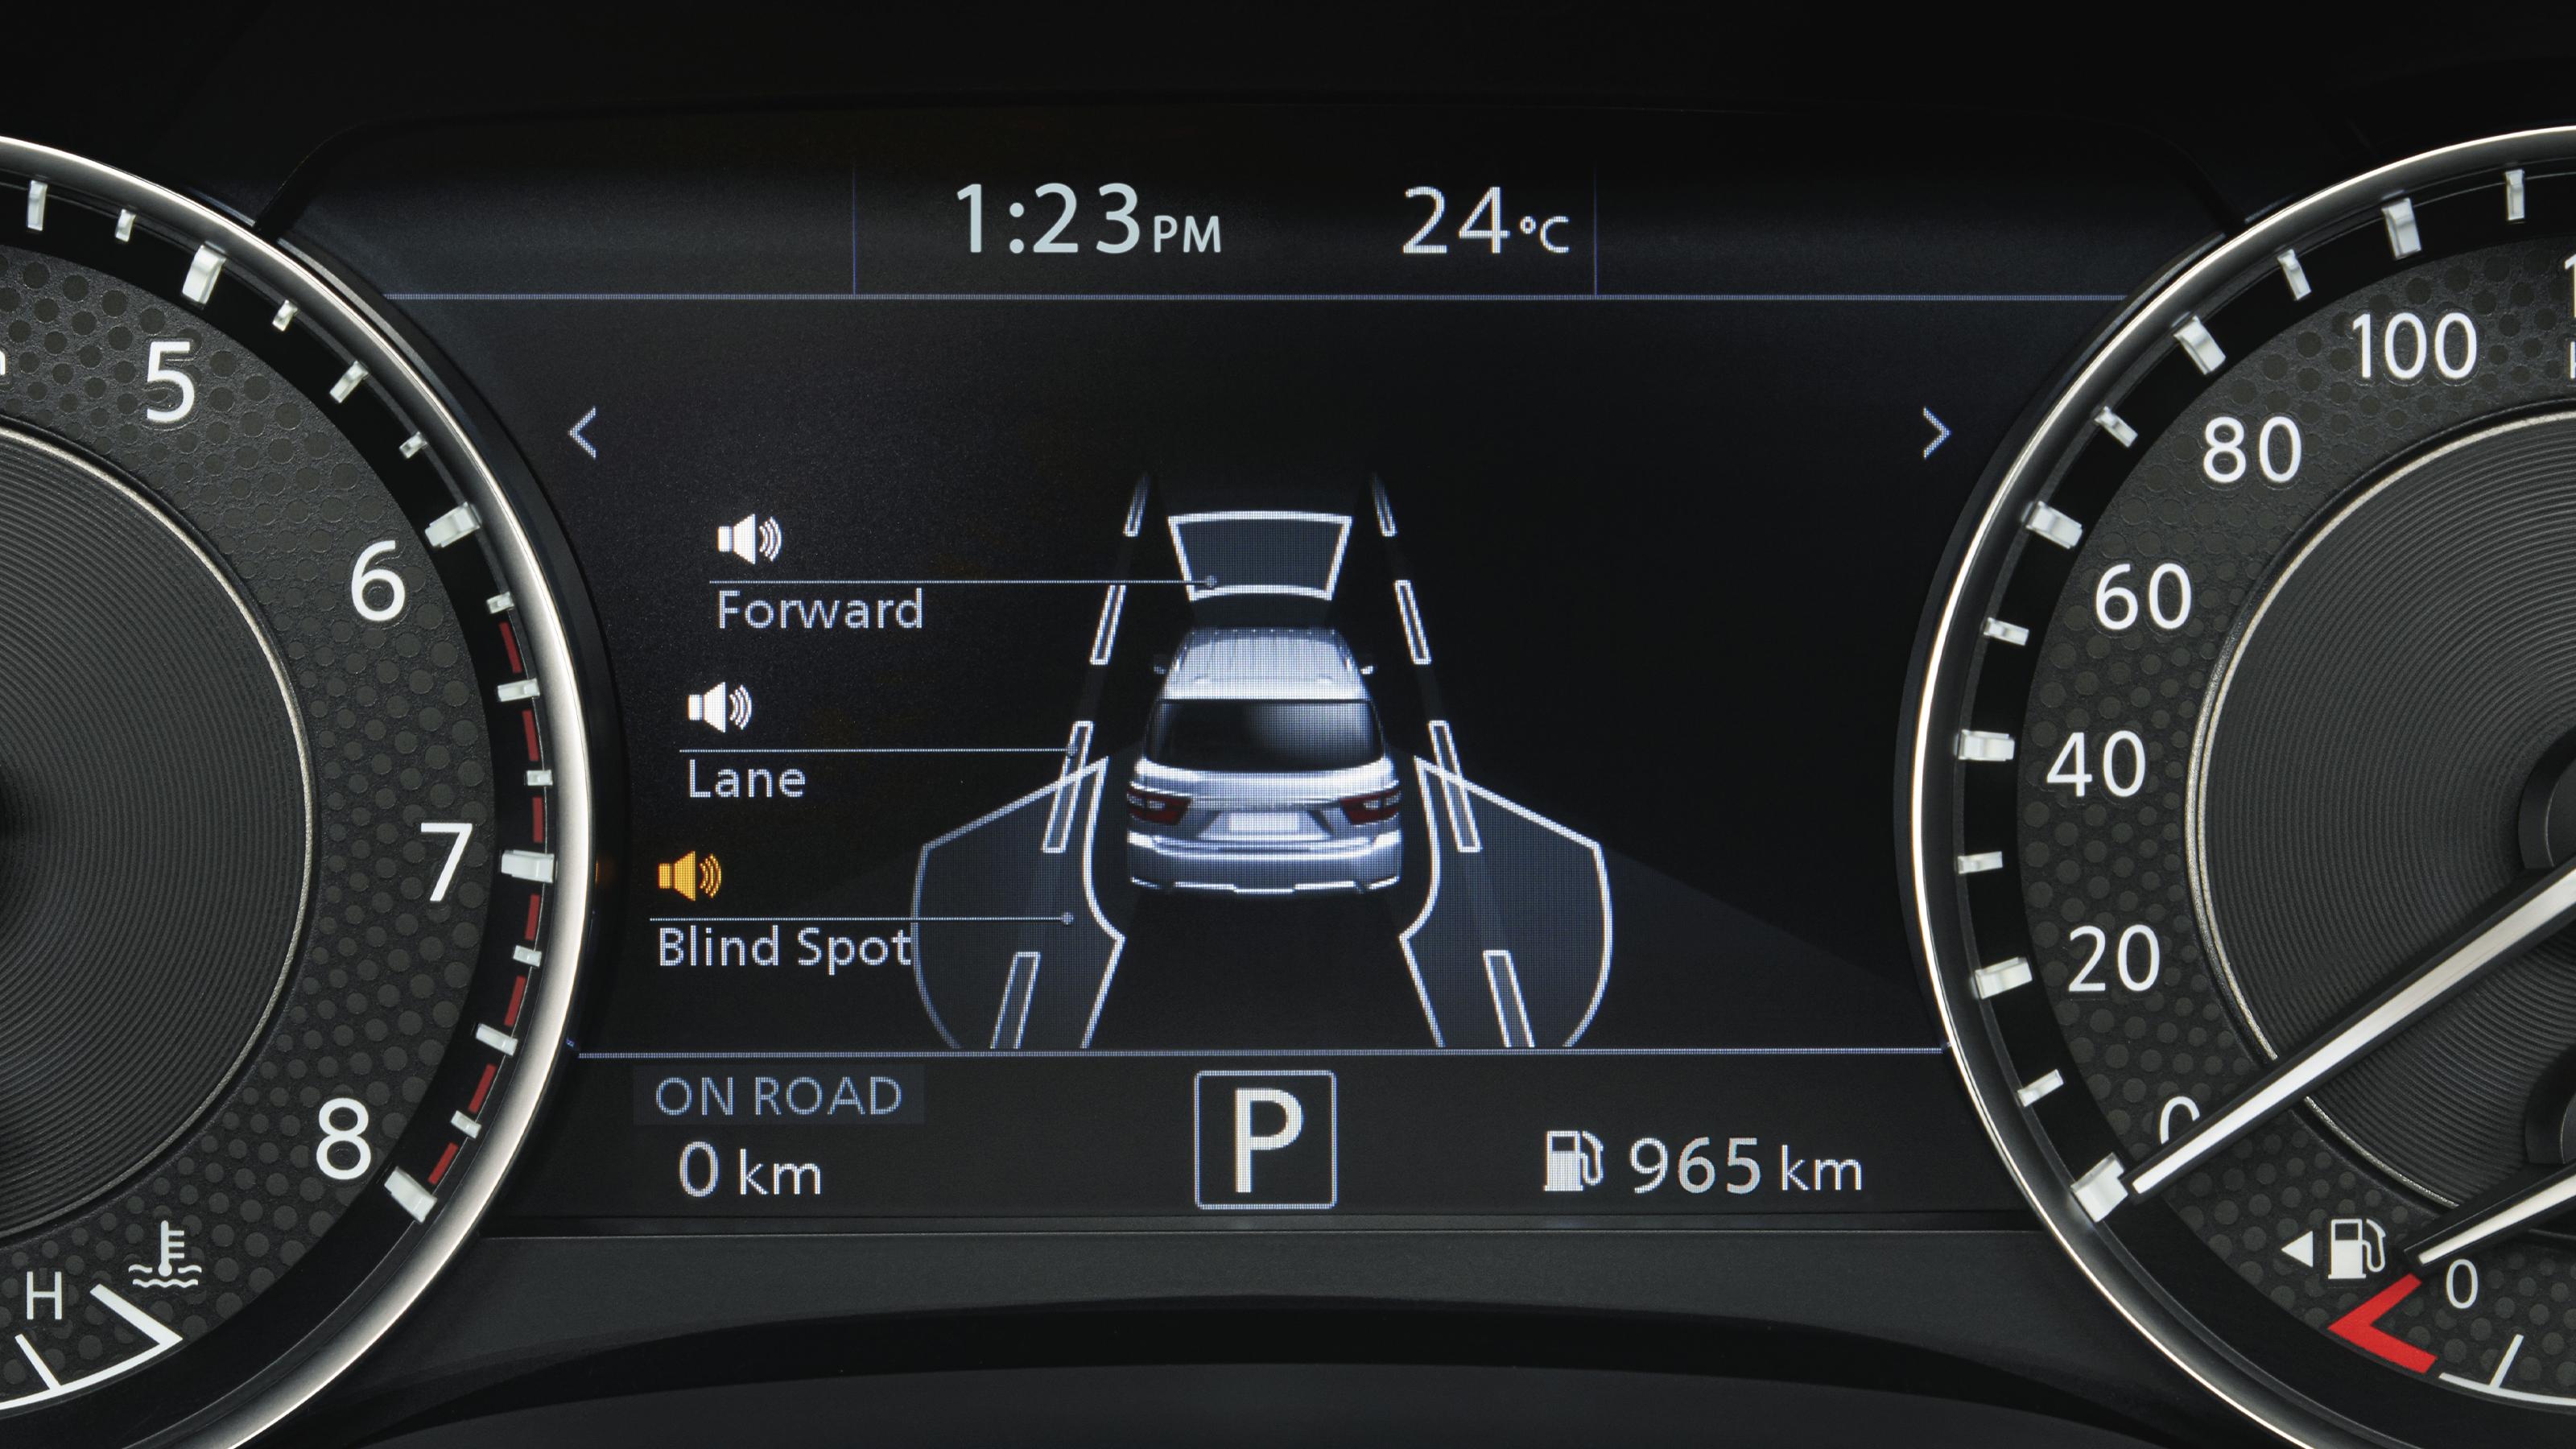 2020 NISSAN PATROL driver information display